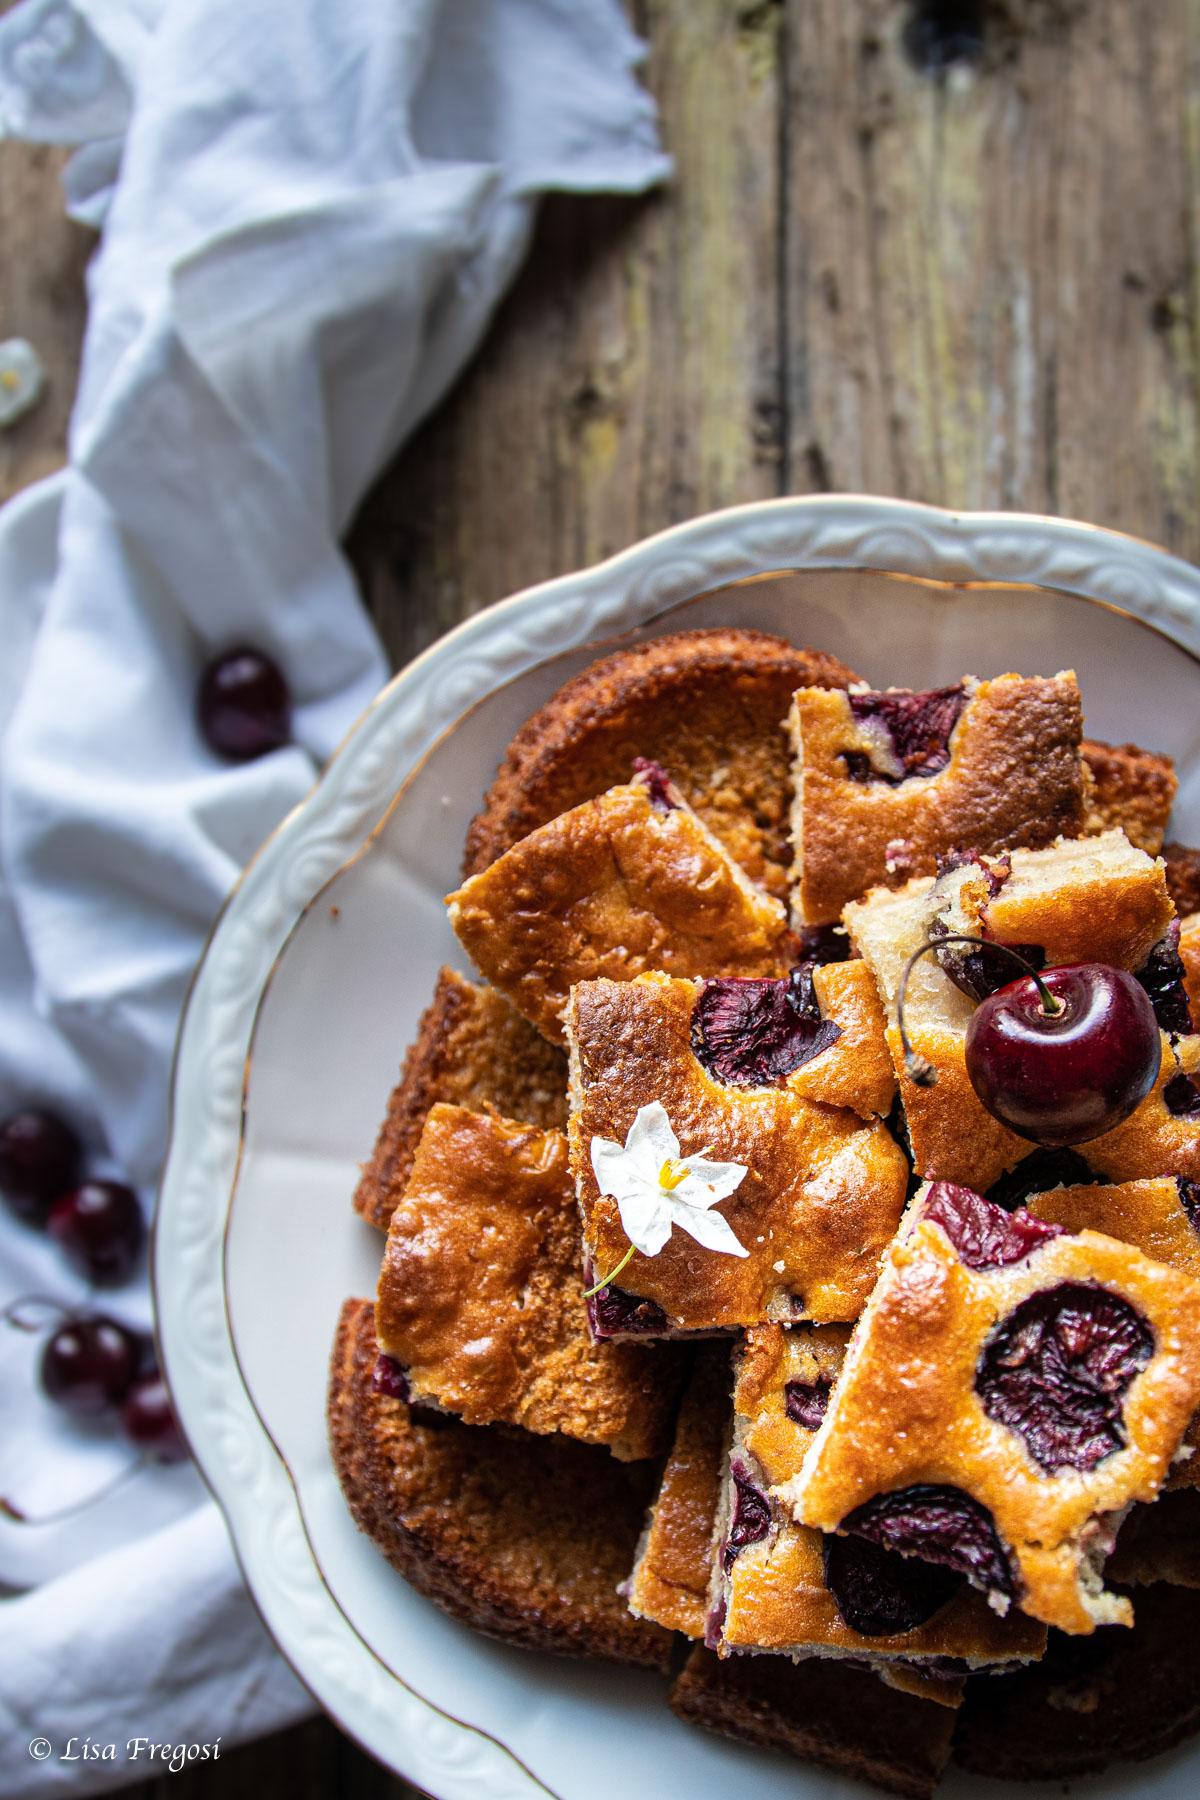 Torta soffice ciliegie saranno ricetta facile